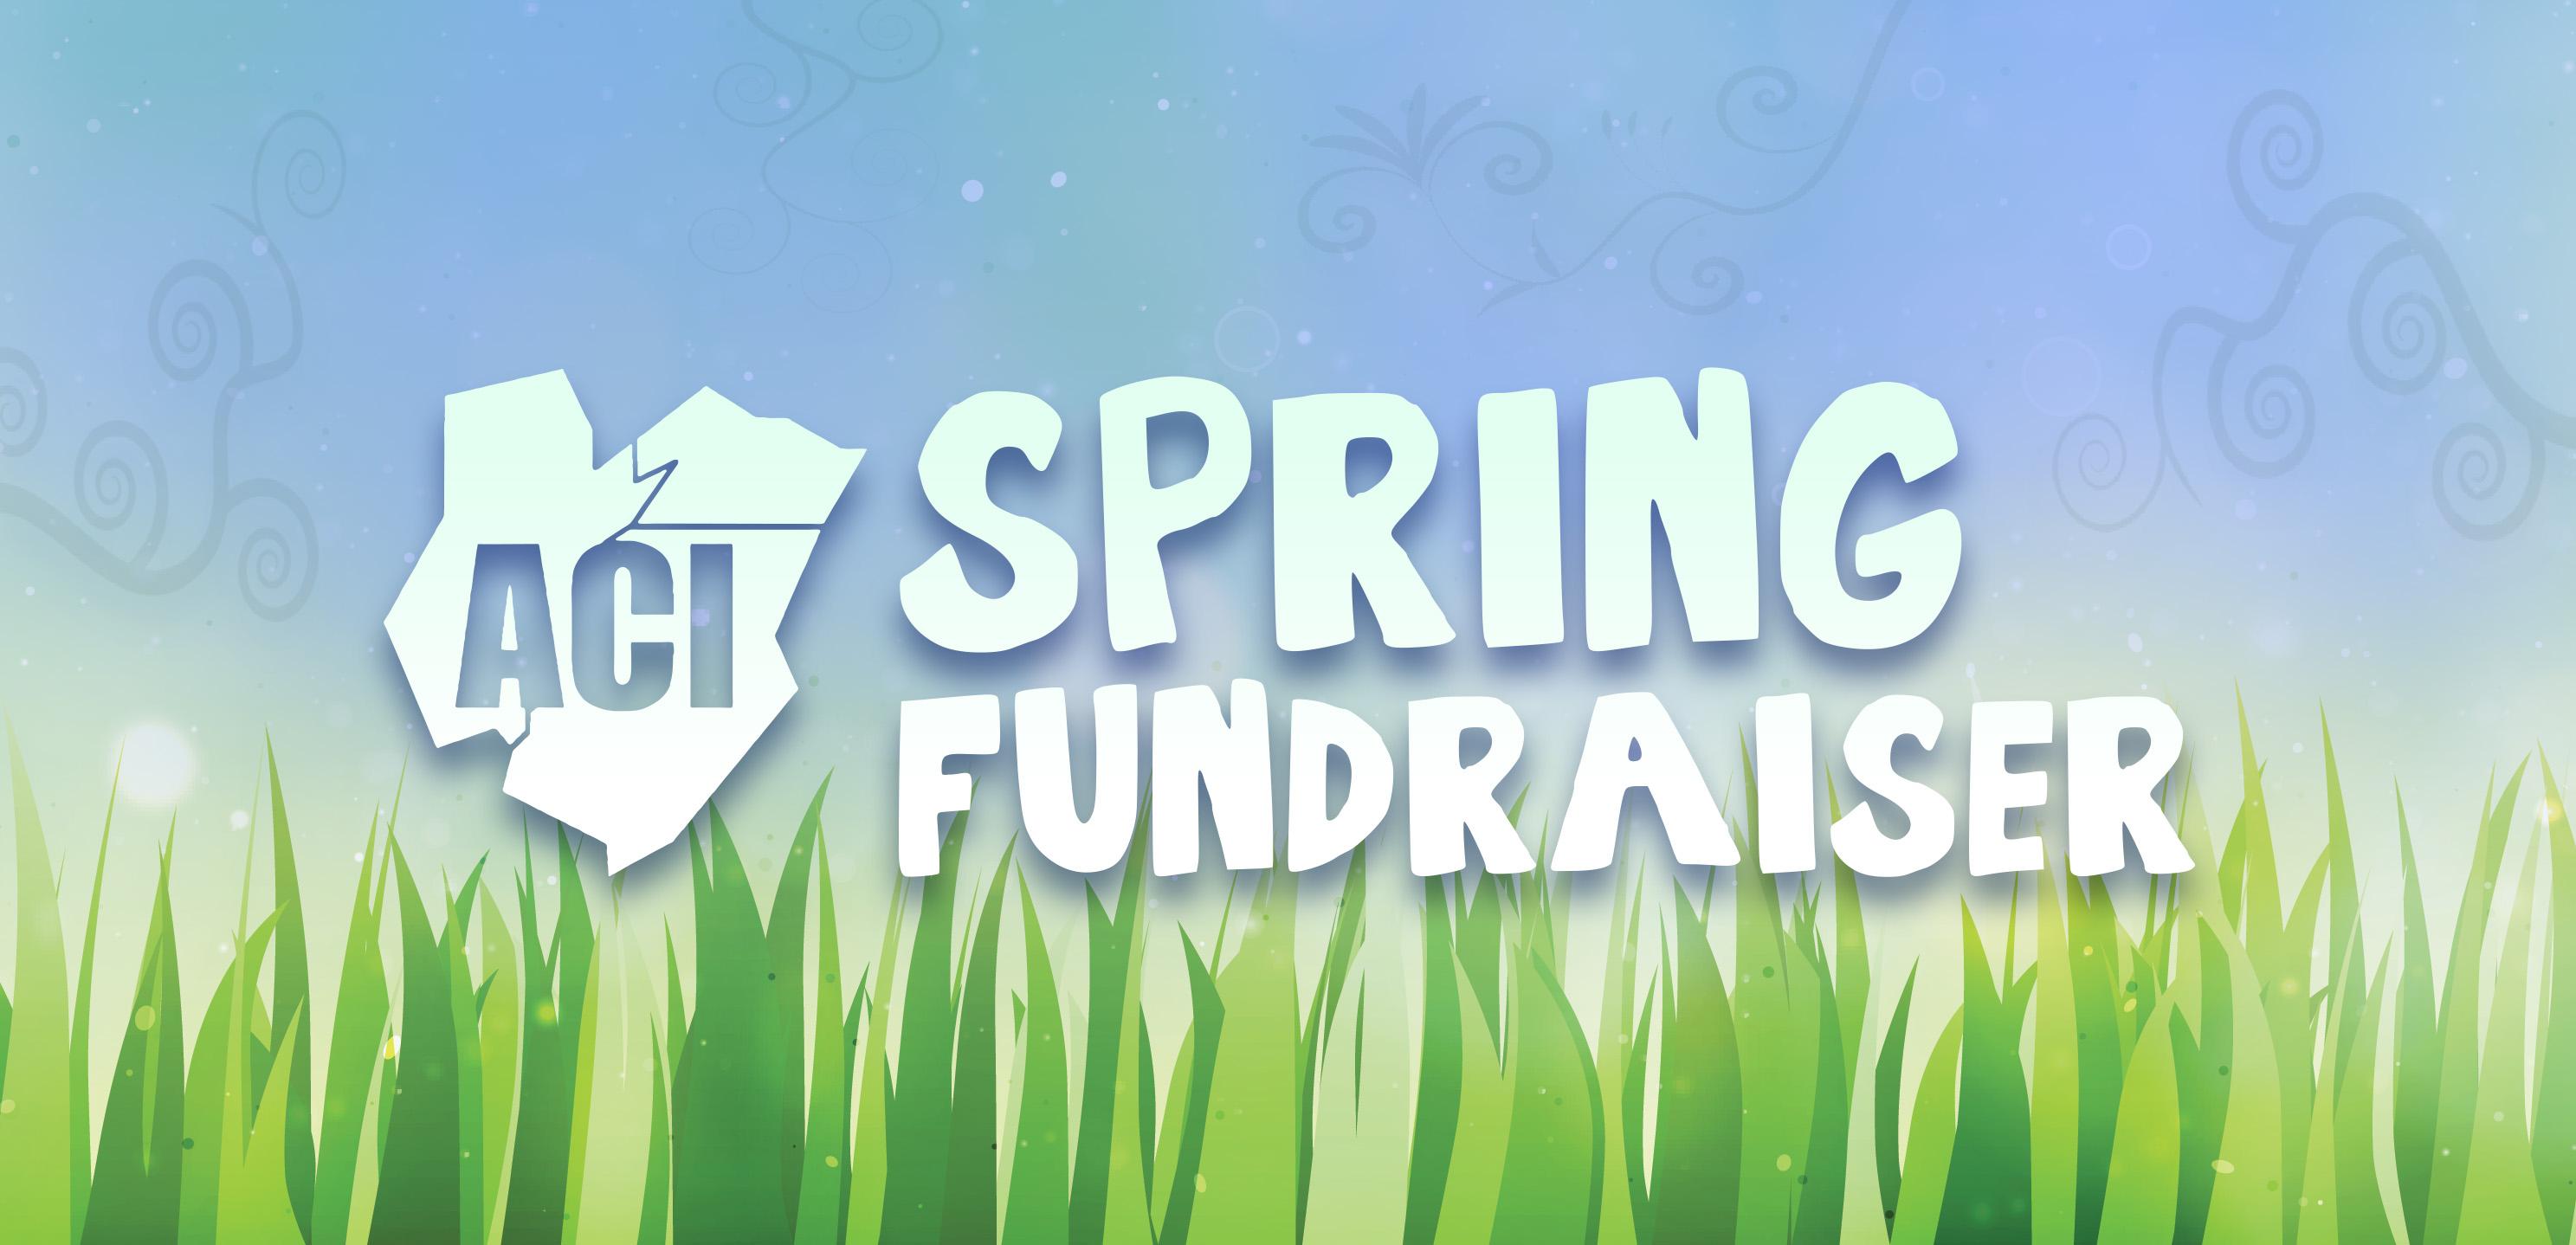 087c68eb5c717a837576_Spring_Fundraiser.jpg